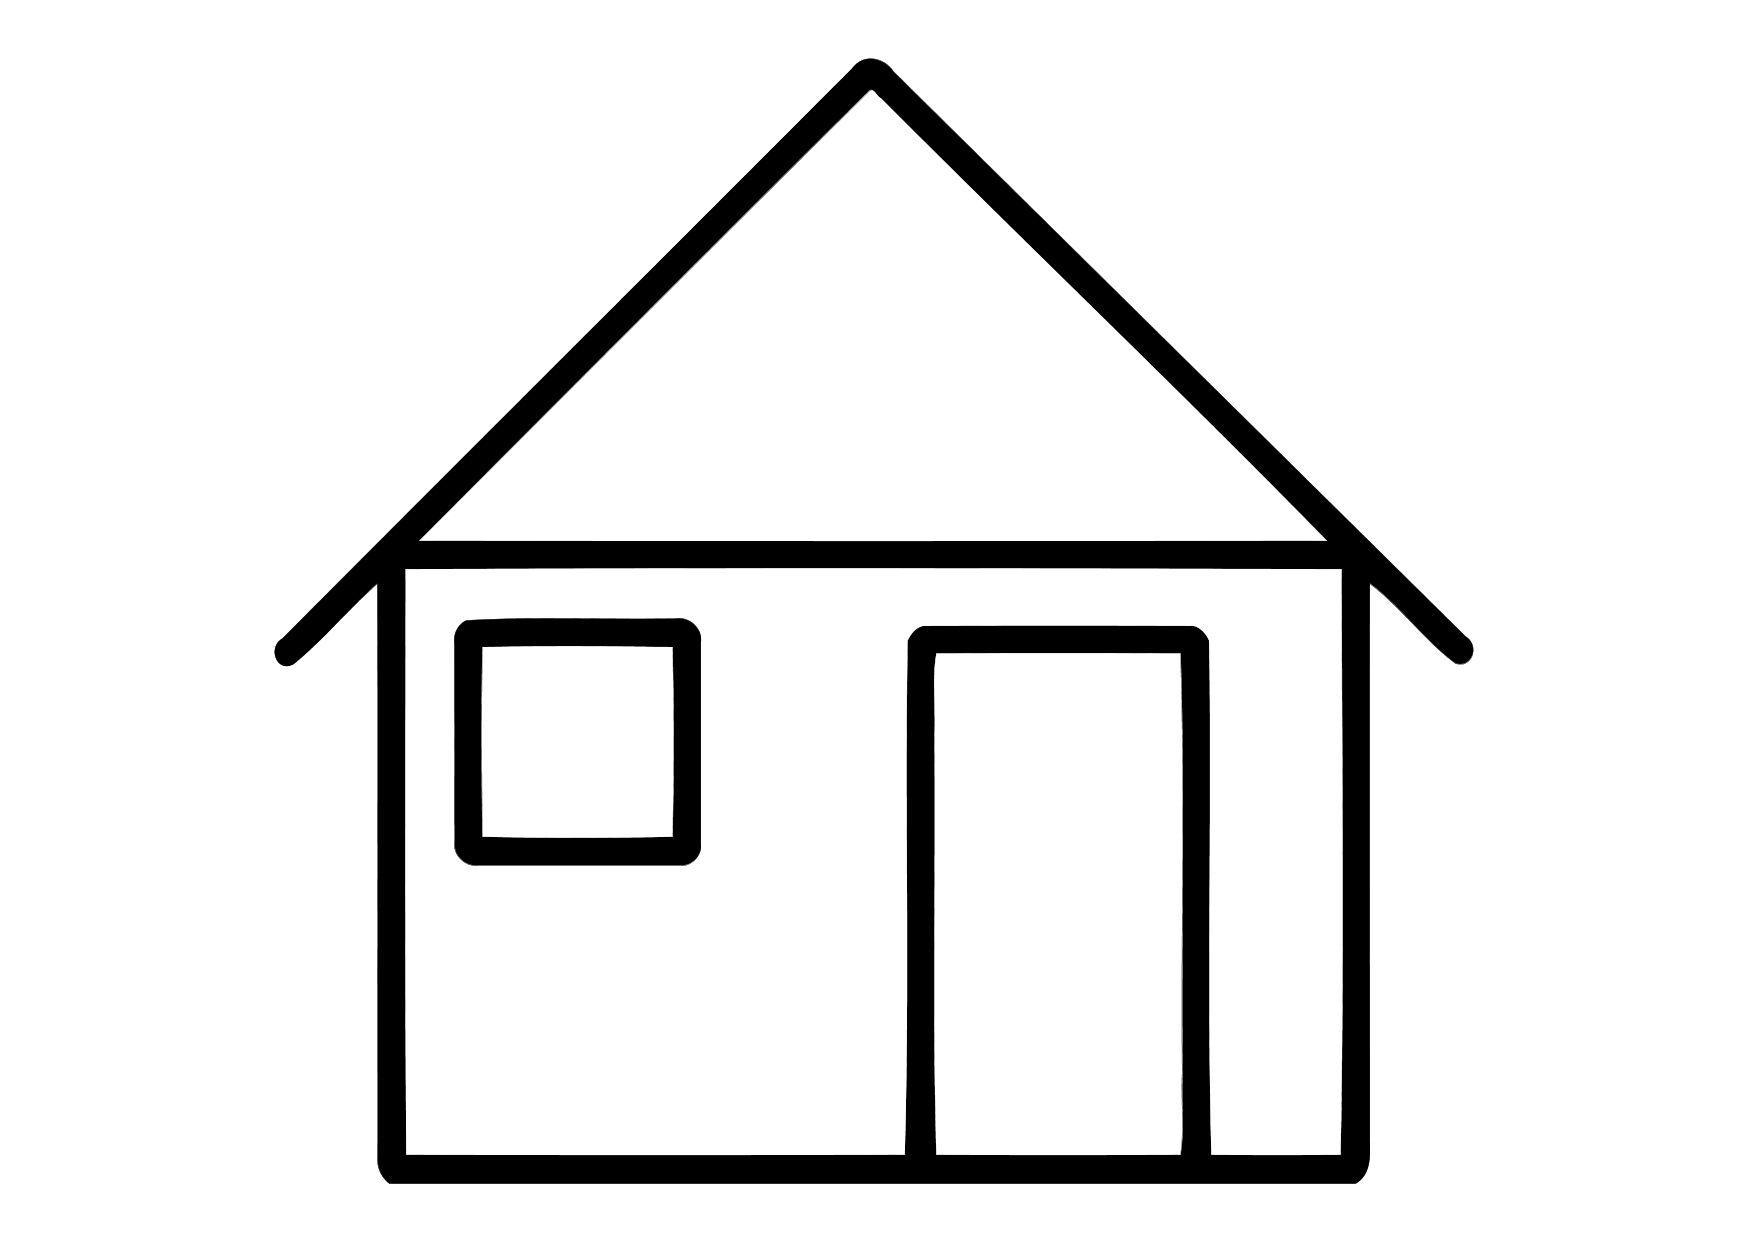 Coloriage maison img 11324 - Image maison dessin ...